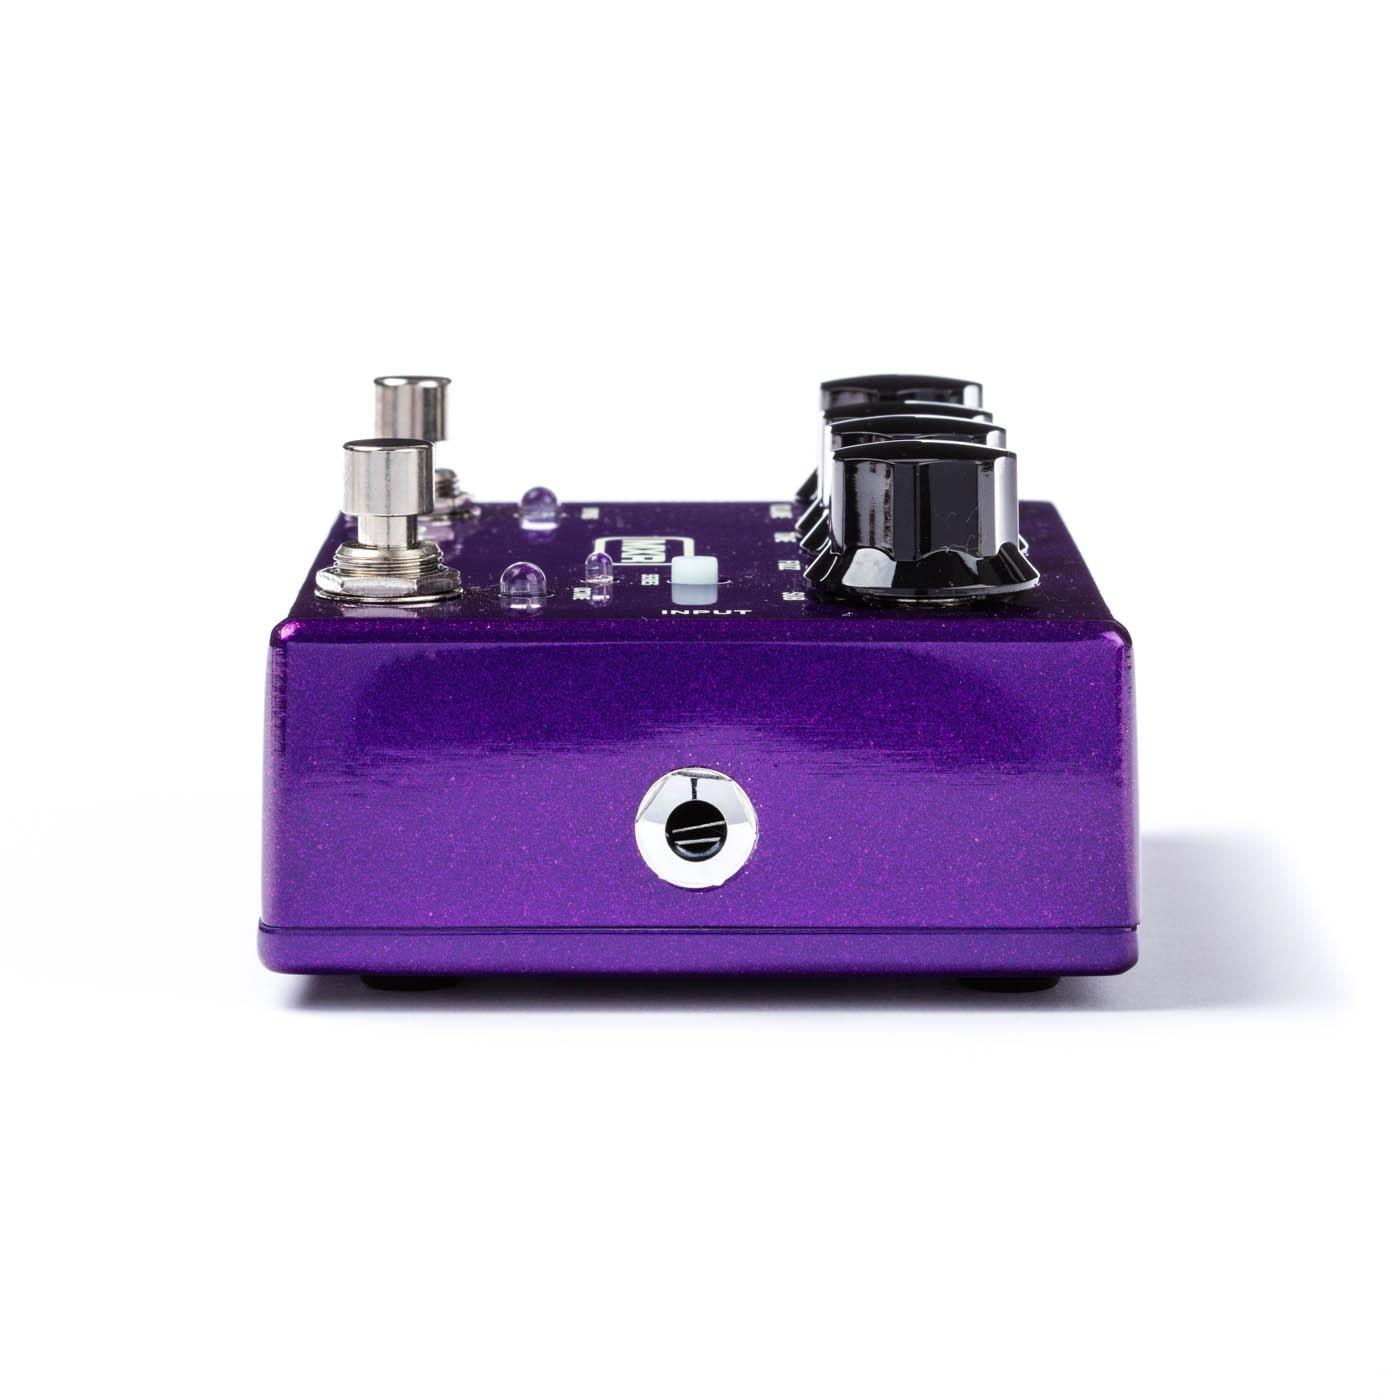 mxr sub machine octave fuzz pedal m225 guitarshop folkestone. Black Bedroom Furniture Sets. Home Design Ideas